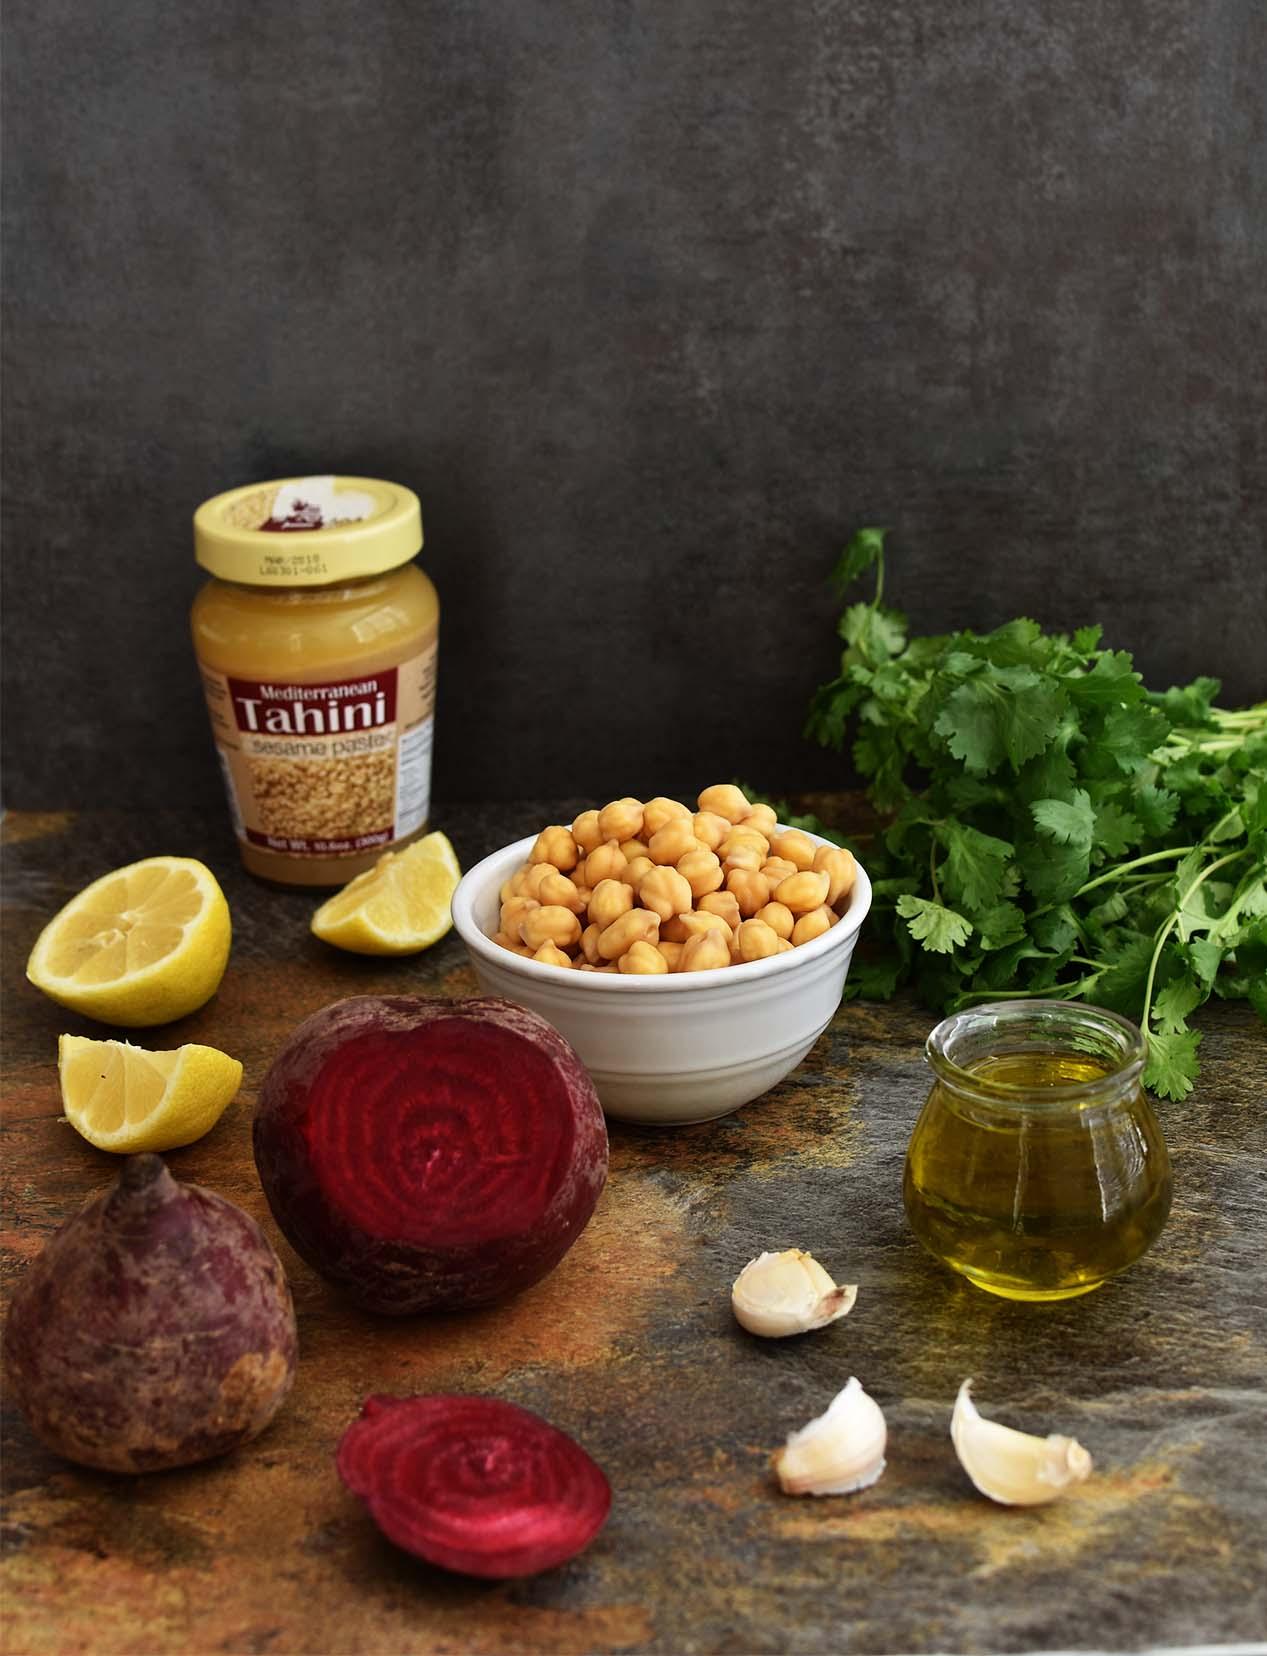 Beetroot Hummus - Pepper Delight #pepperdelightblog #recipe #hummus #beetroot #dip #chickpeas #vegeterian #christmasrecipes #appetizer #mediterranean #spread #thanksgiving #newyear #gameday #meatless